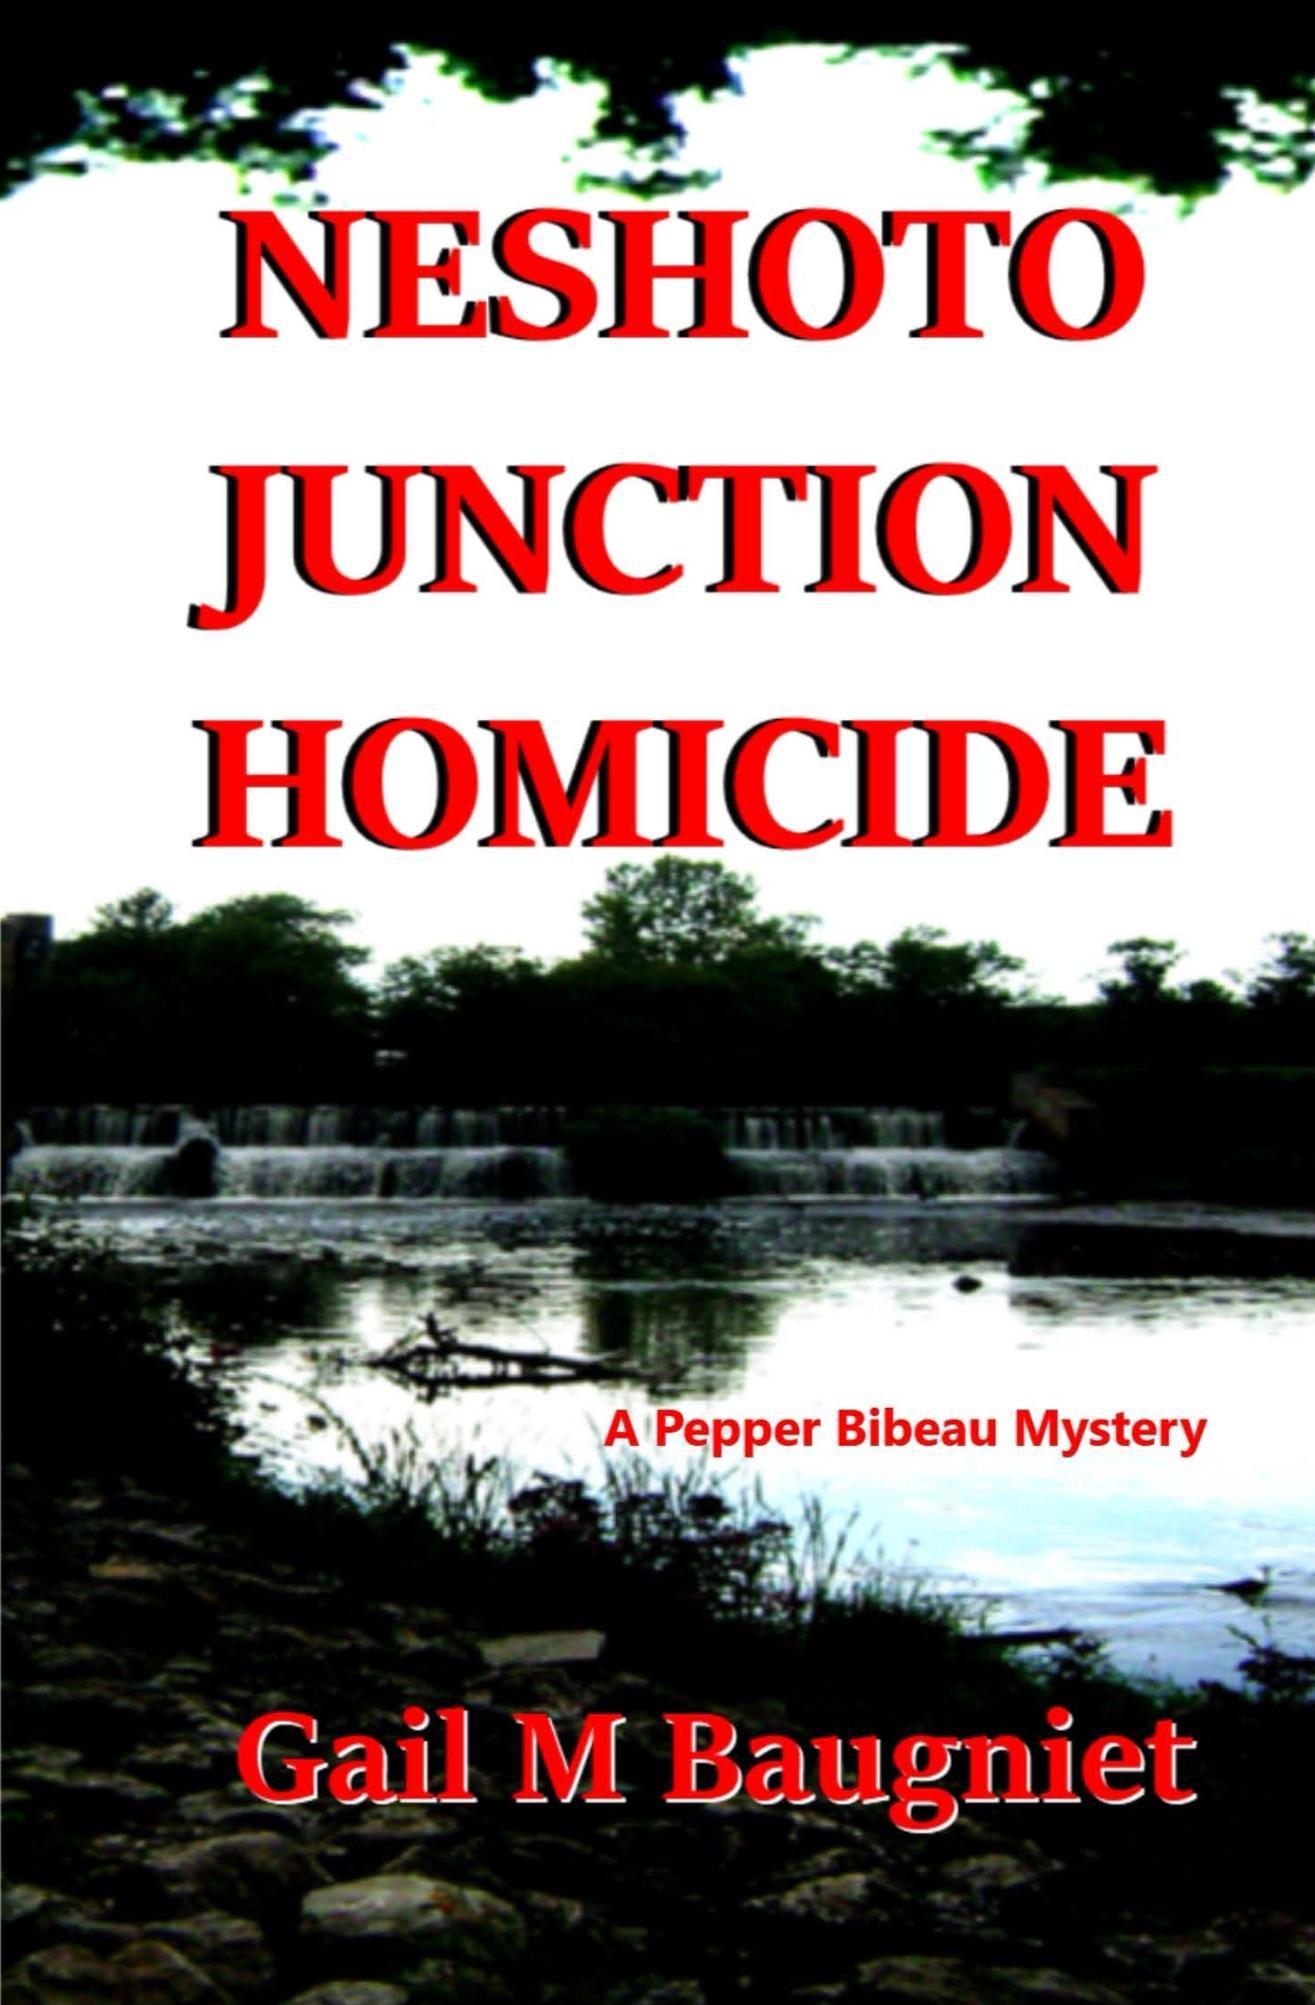 Neshoto Junction Homicide (Pepper Bibeau Mysteries #4) Gail M. Baugniet